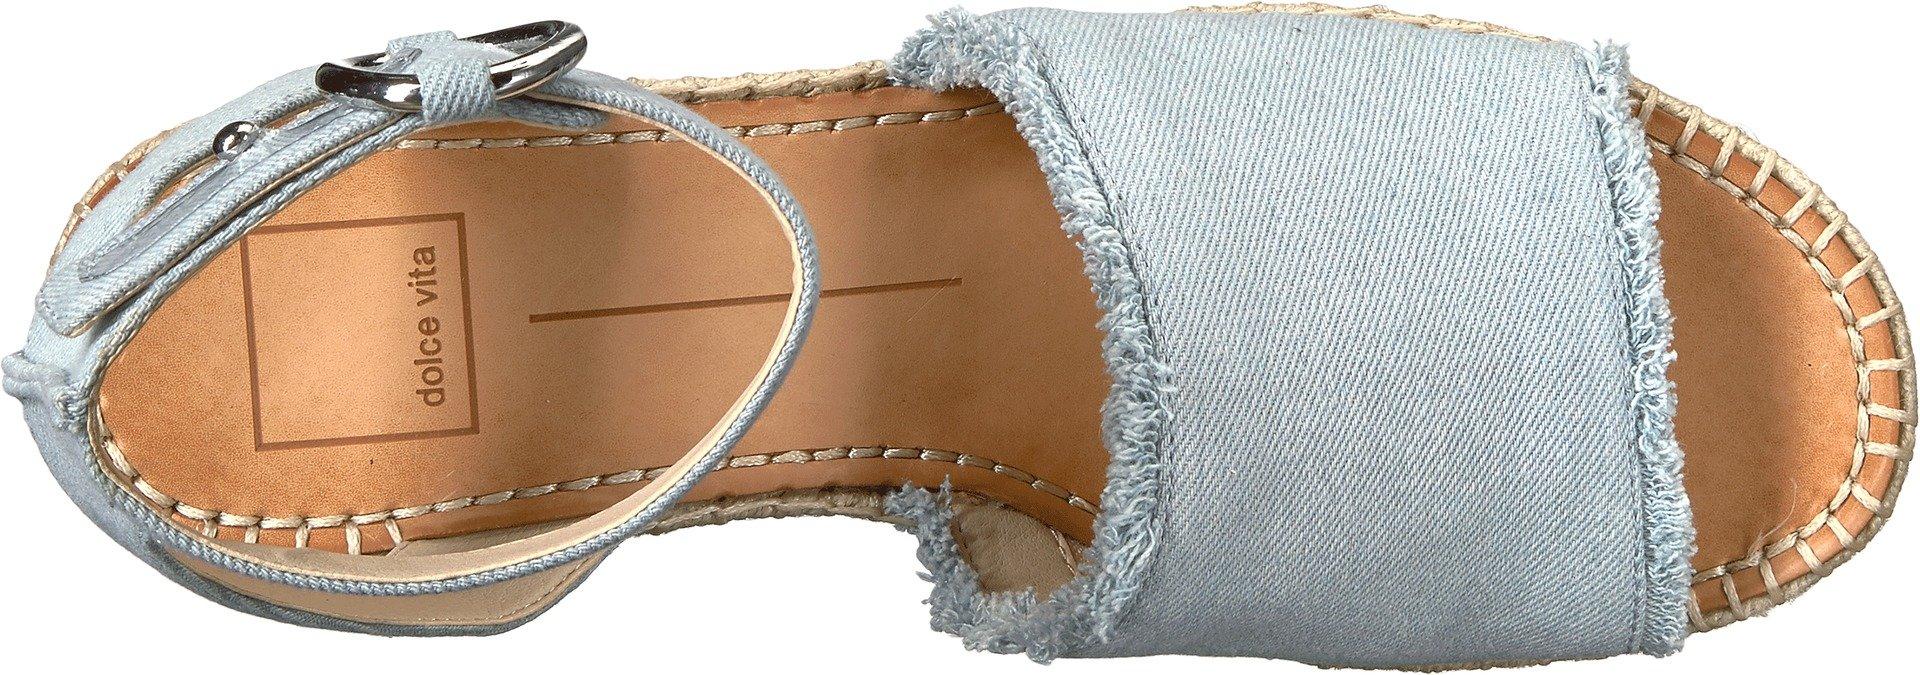 Dolce Vita Women's Lesly Espadrille Wedge Sandal, Light Blue Denim, 7.5 M US by Dolce Vita (Image #2)